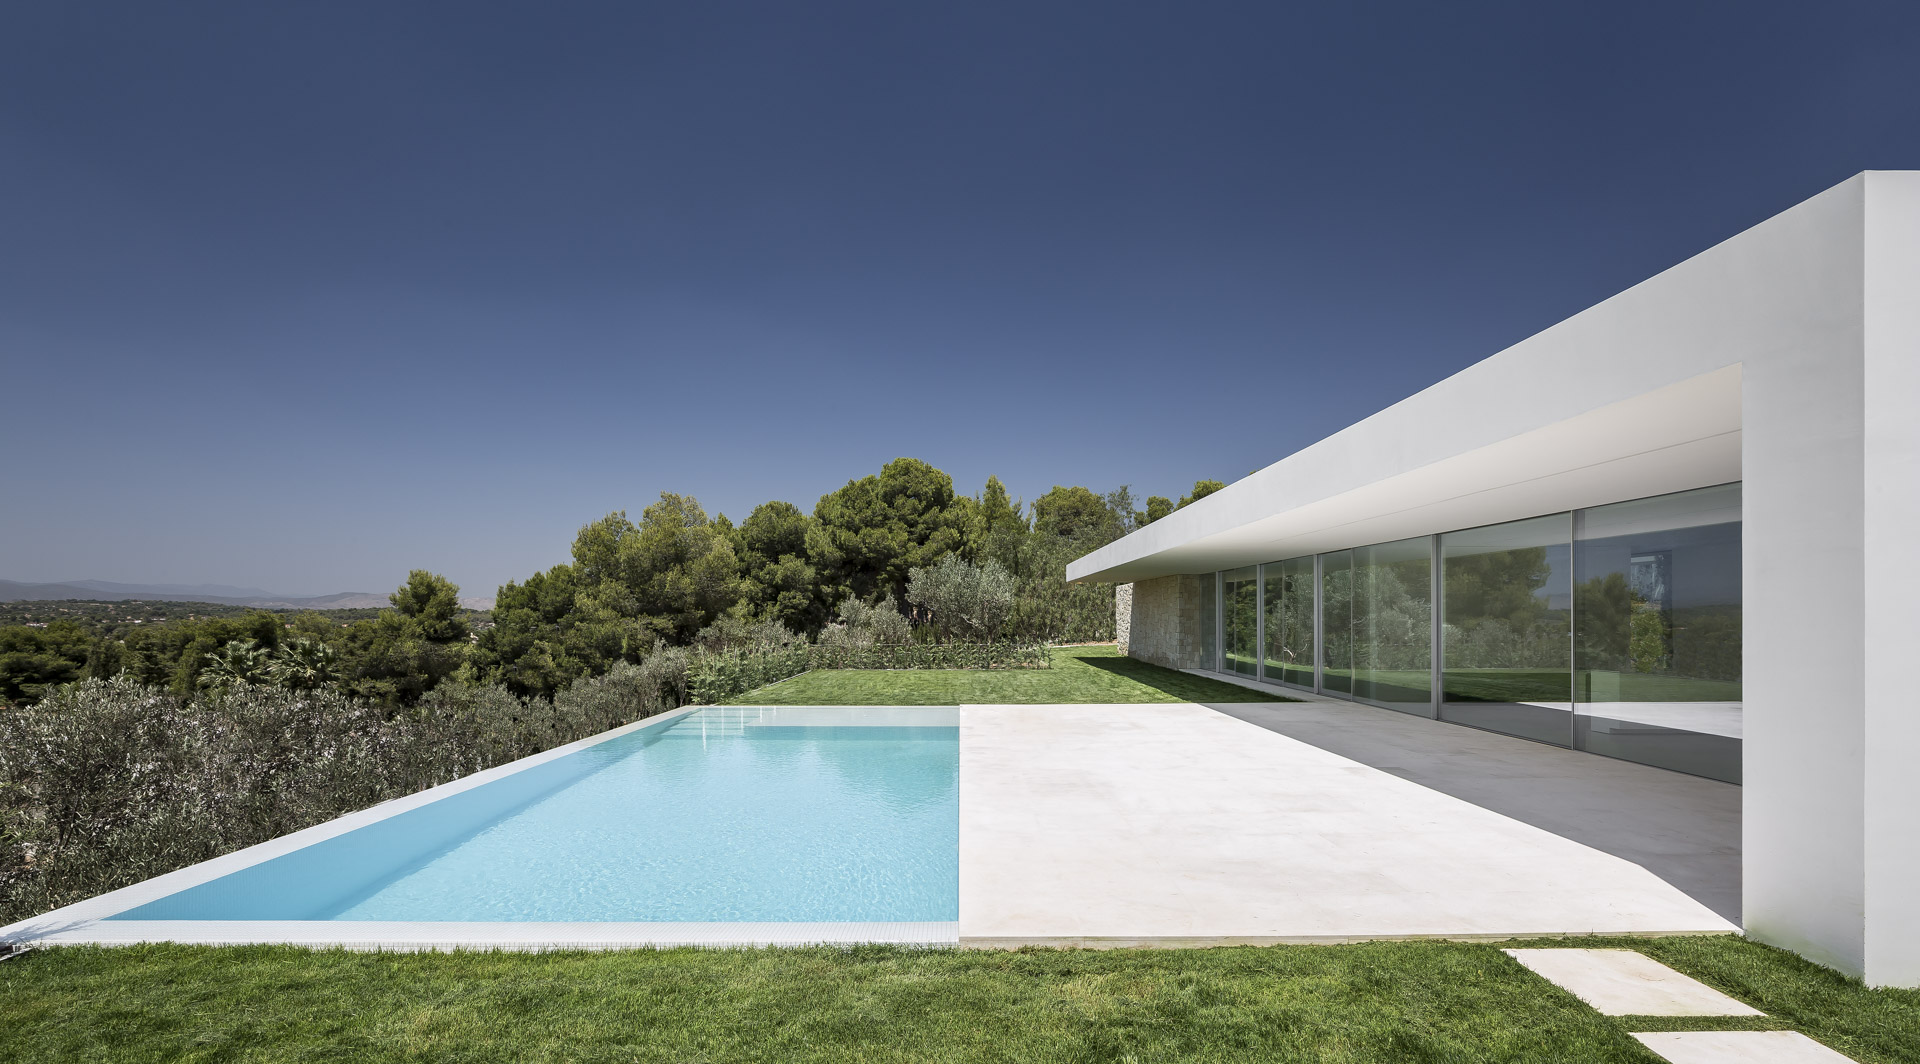 fotografia-arquitectura-valencia-german-cabo-gallardo-llopis-villamarchante-vivienda-17